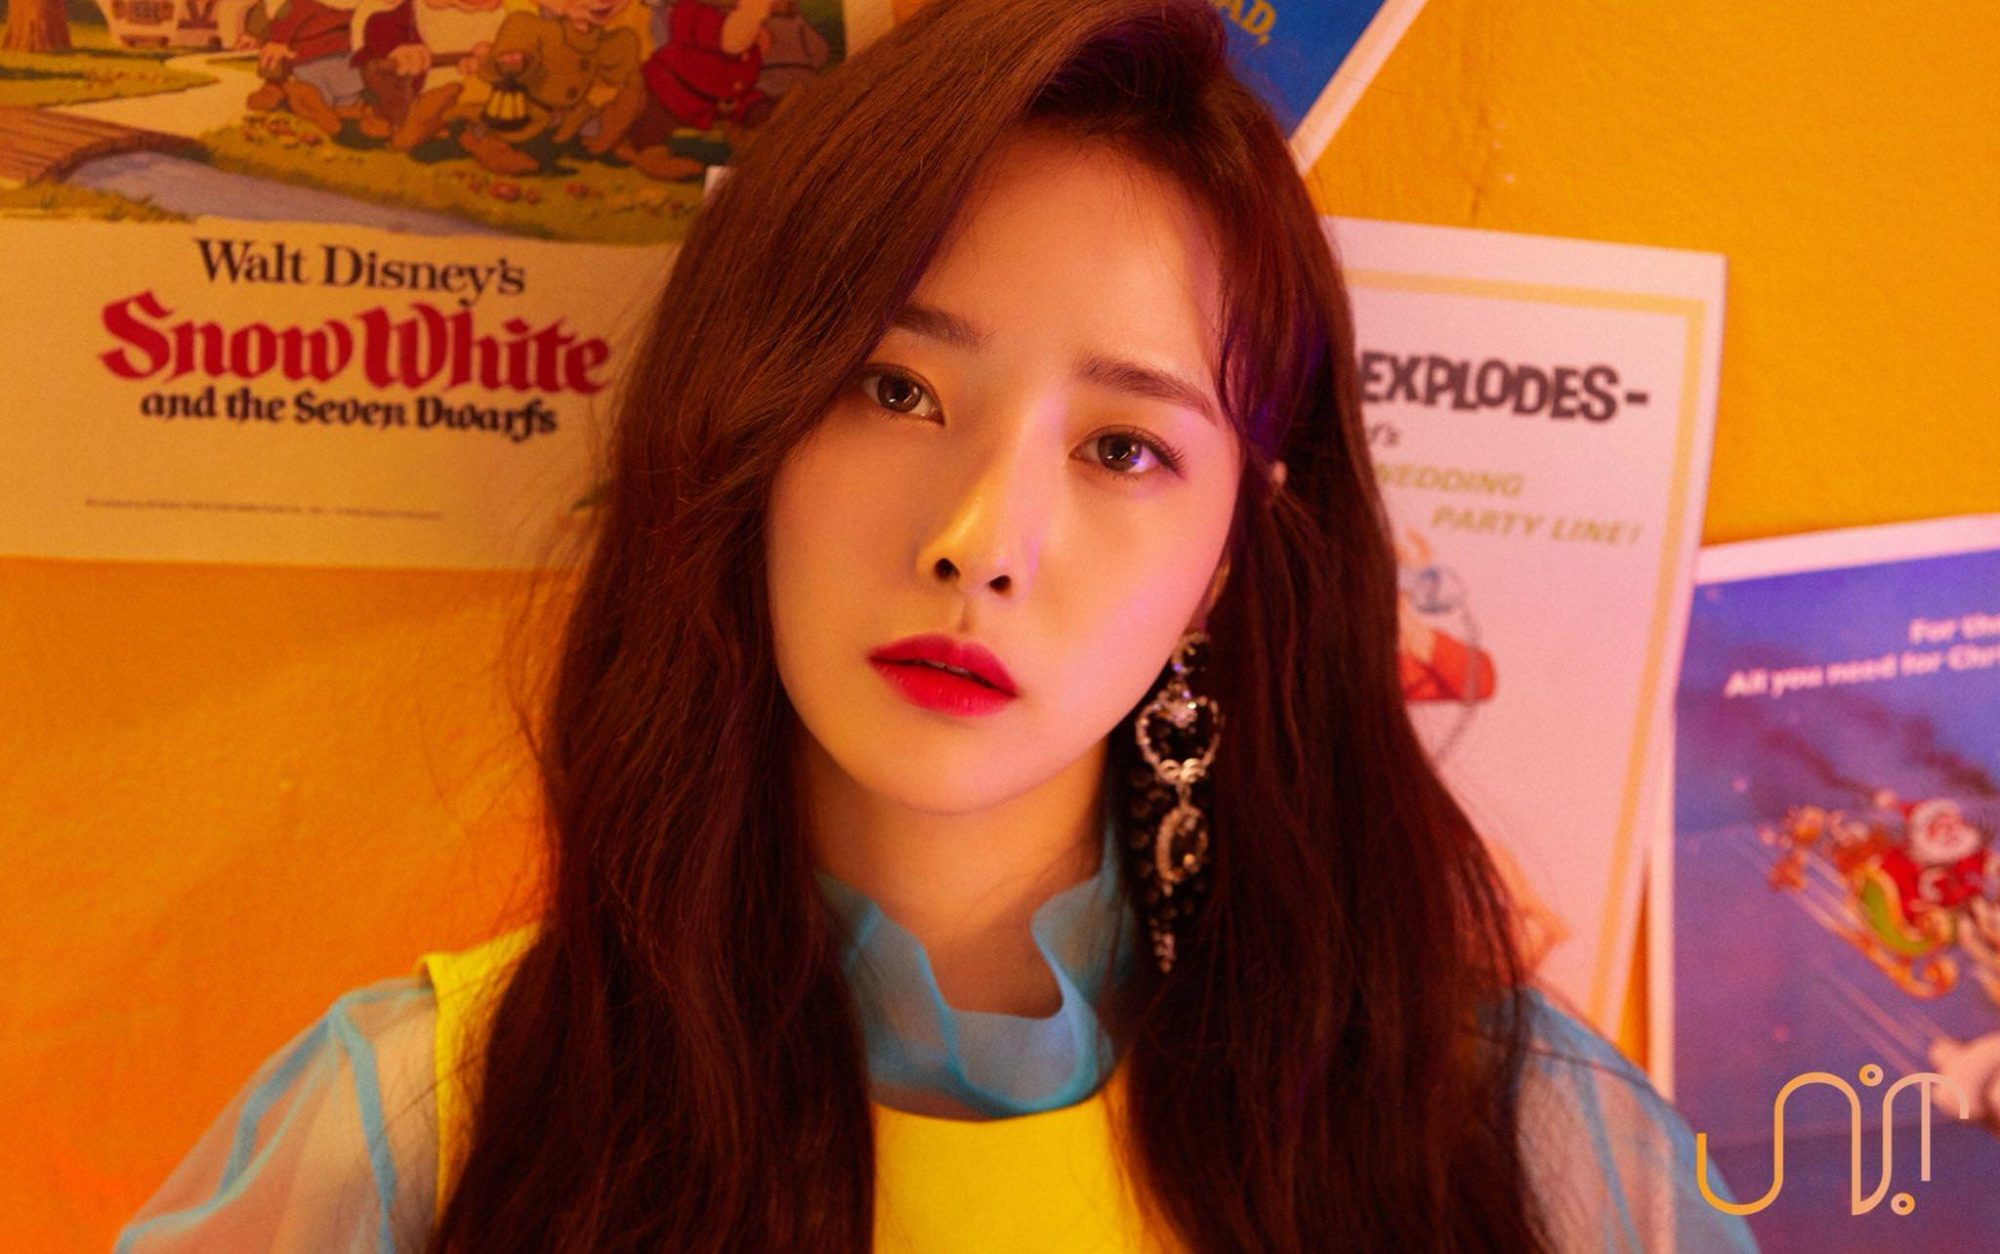 Woohee Profile